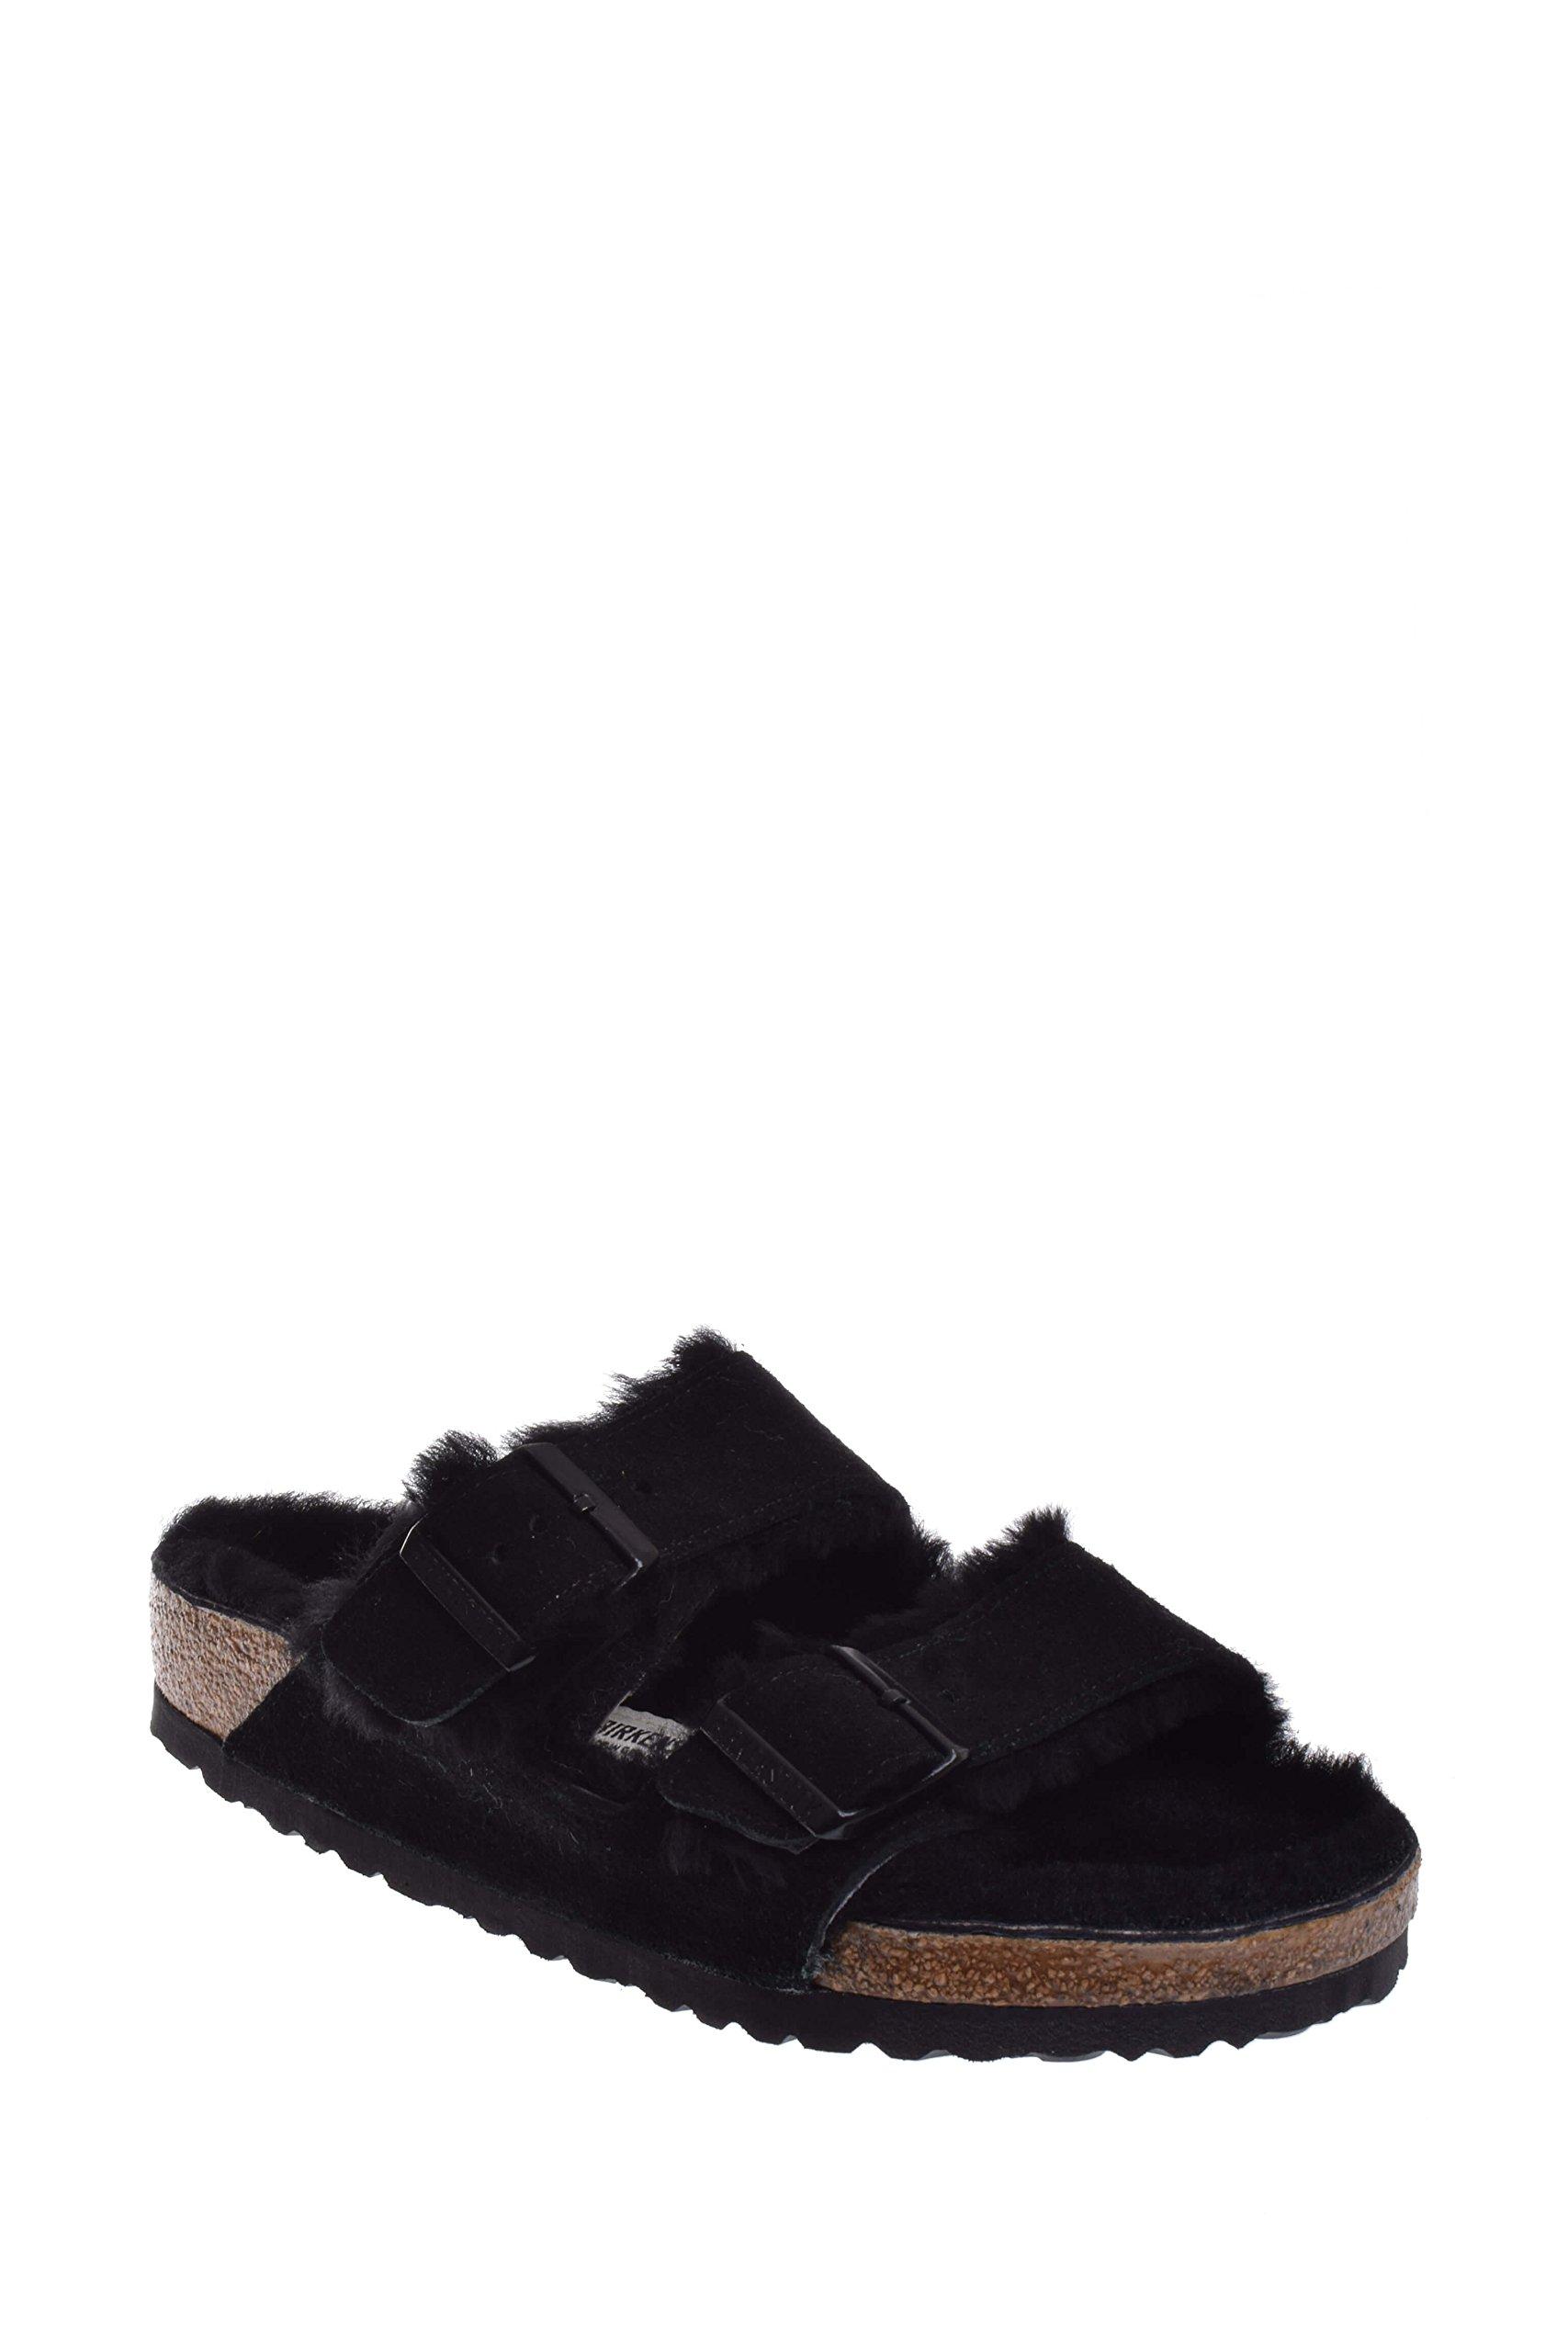 Birkenstock Unisex Arizona Shearling Lined Sandal, Black/Black Suede, 40 M EU by Birkenstock